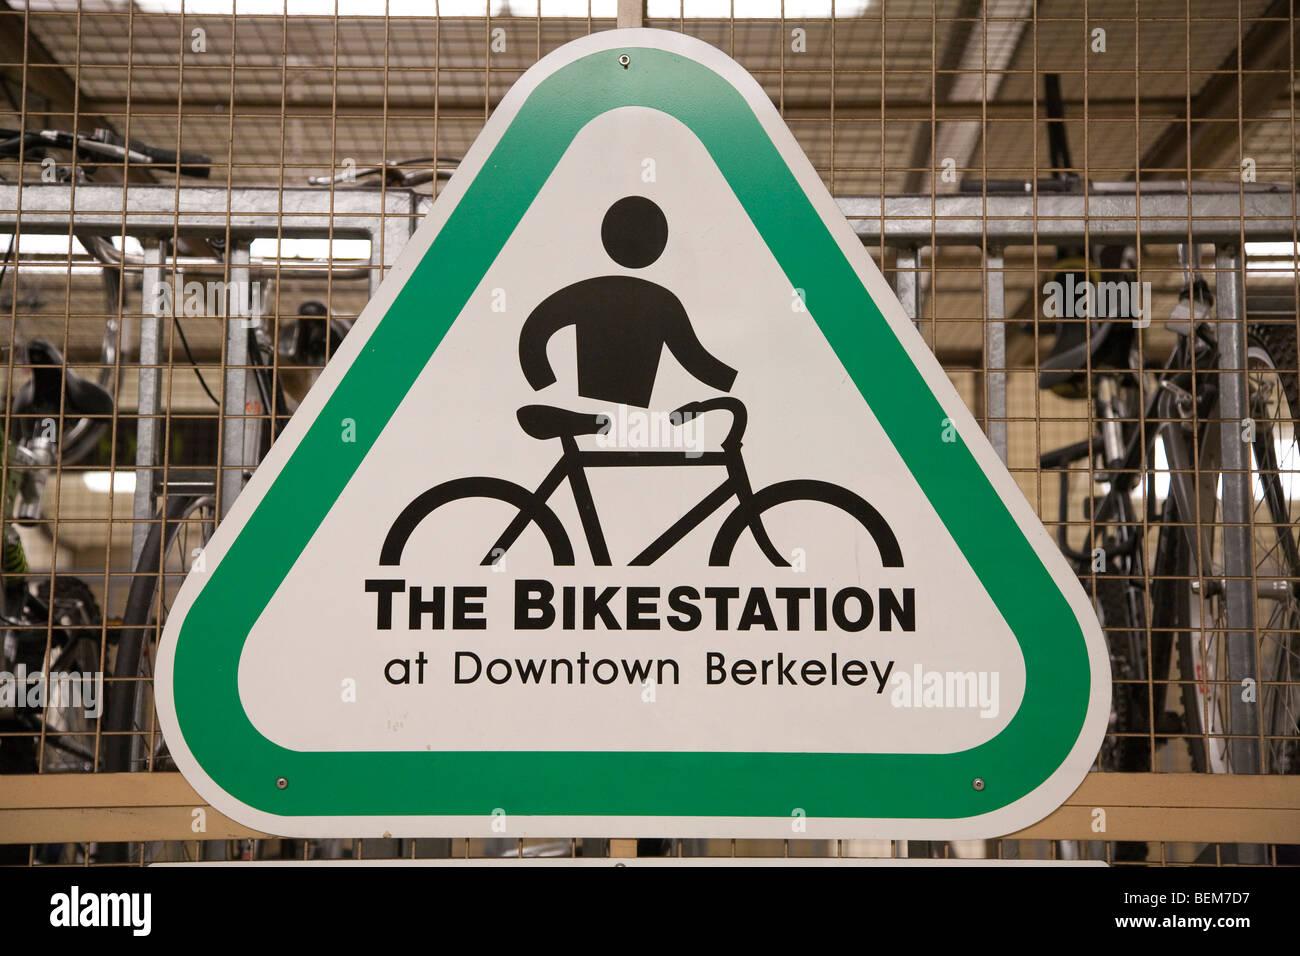 A Bikestation Sign at a Bikestation, Downtown Berkeley BART station. Berkeley, California, USA - Stock Image